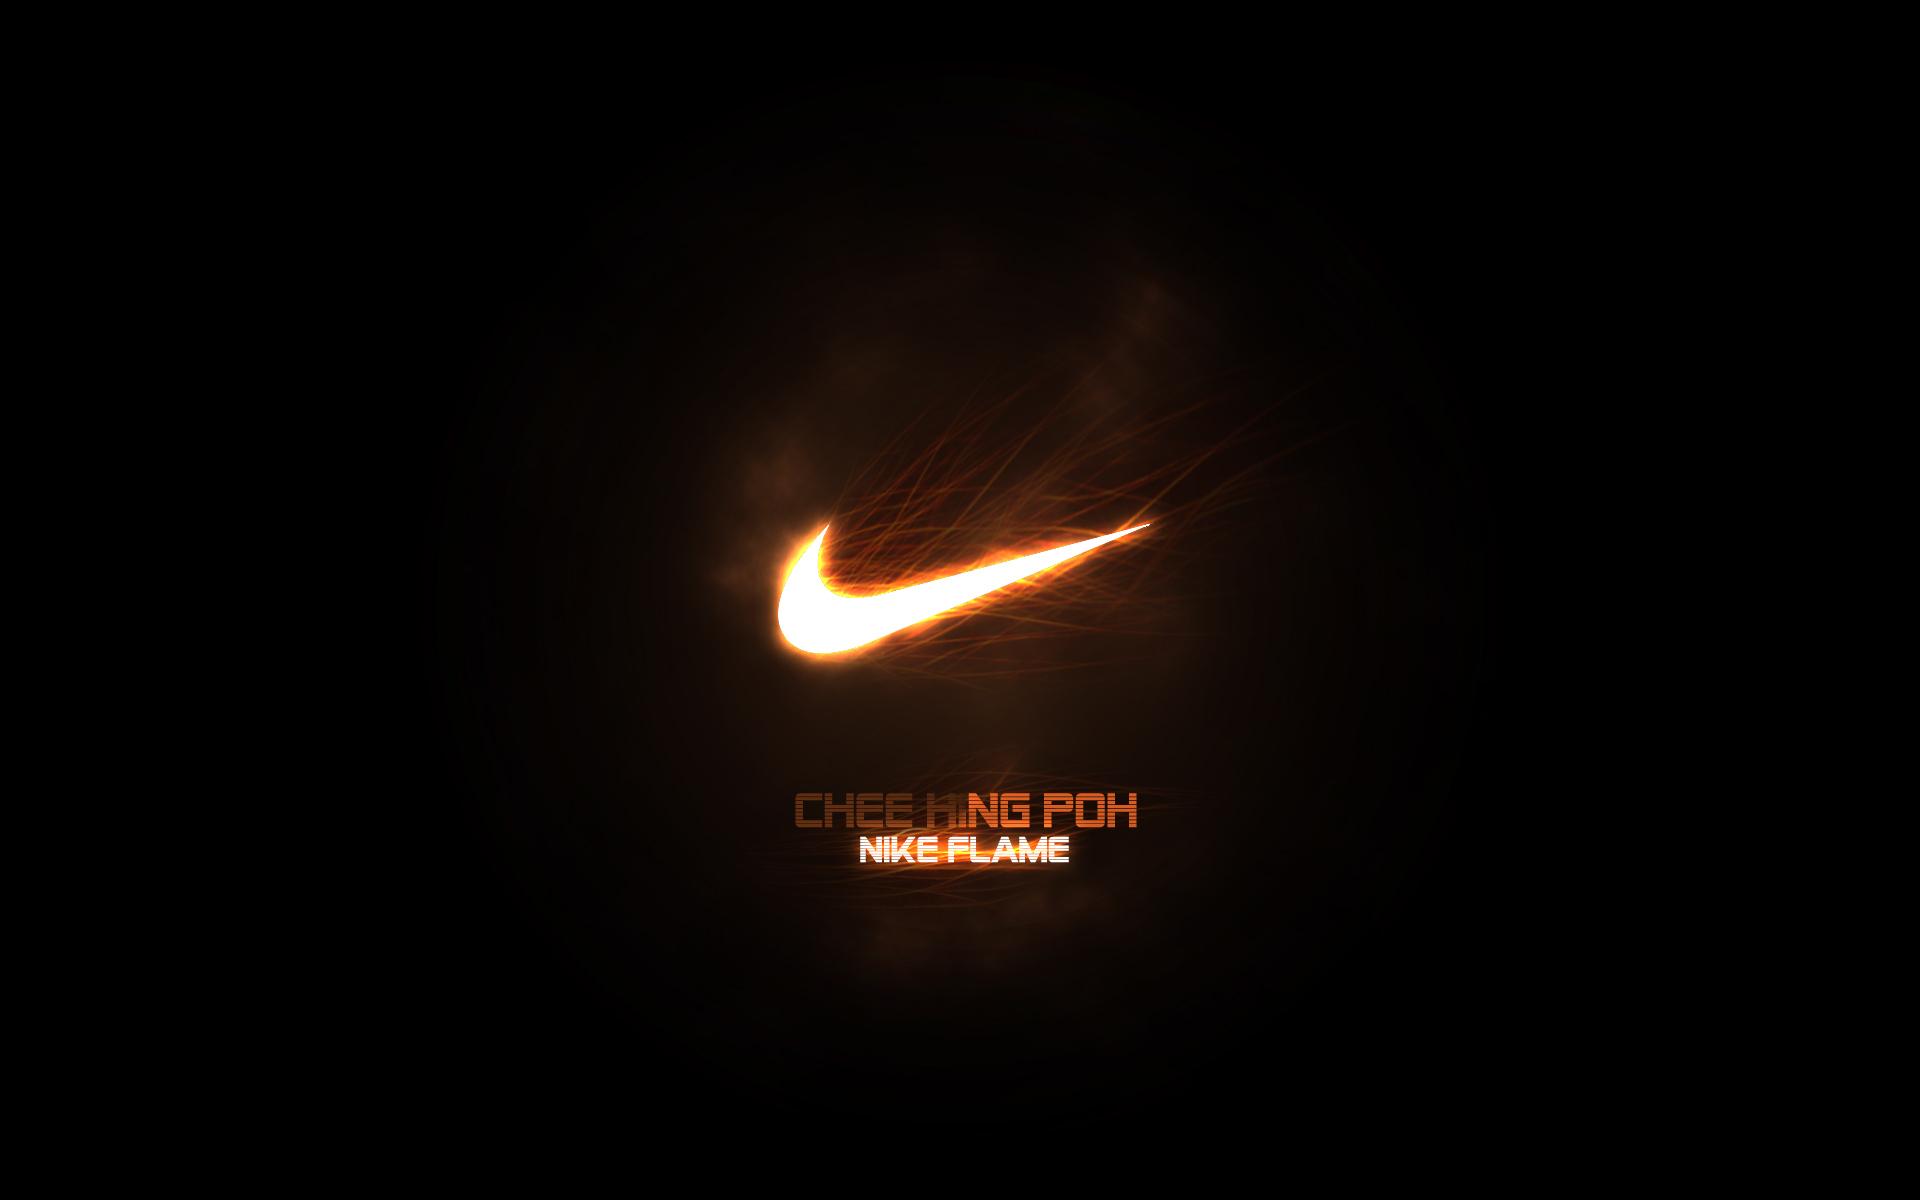 Nike Awesome HD Wallpaper Dekstop Wallpicshd 1920x1200